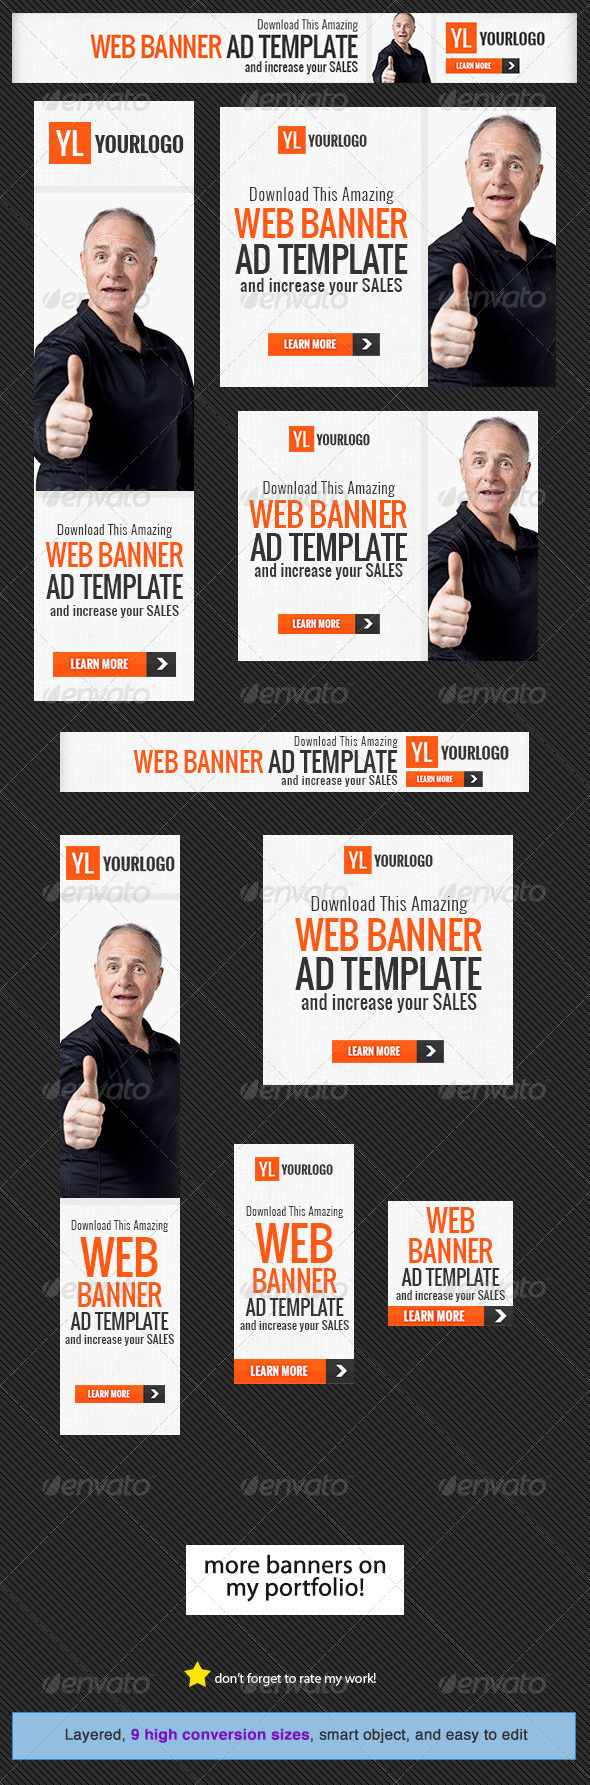 Corporate Web Banner Design Template 20